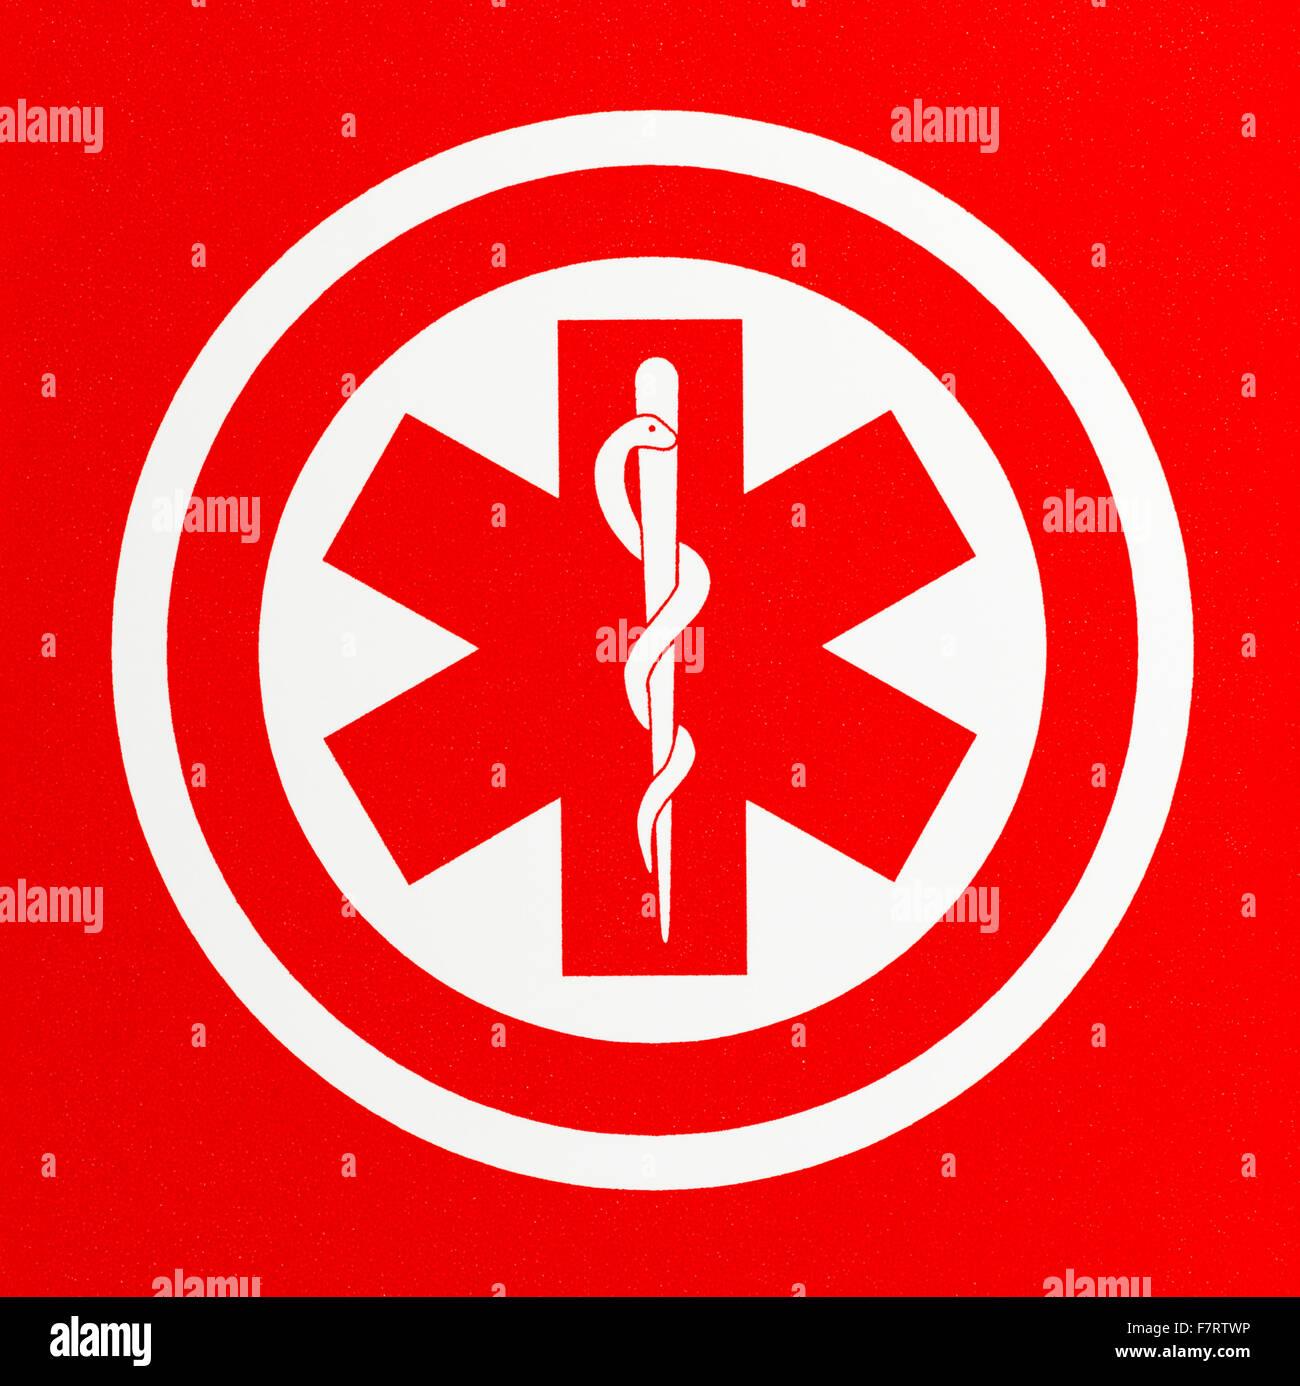 Roten Gesundheitsversorgung Caduceus Symbol im Kreis. Stockbild